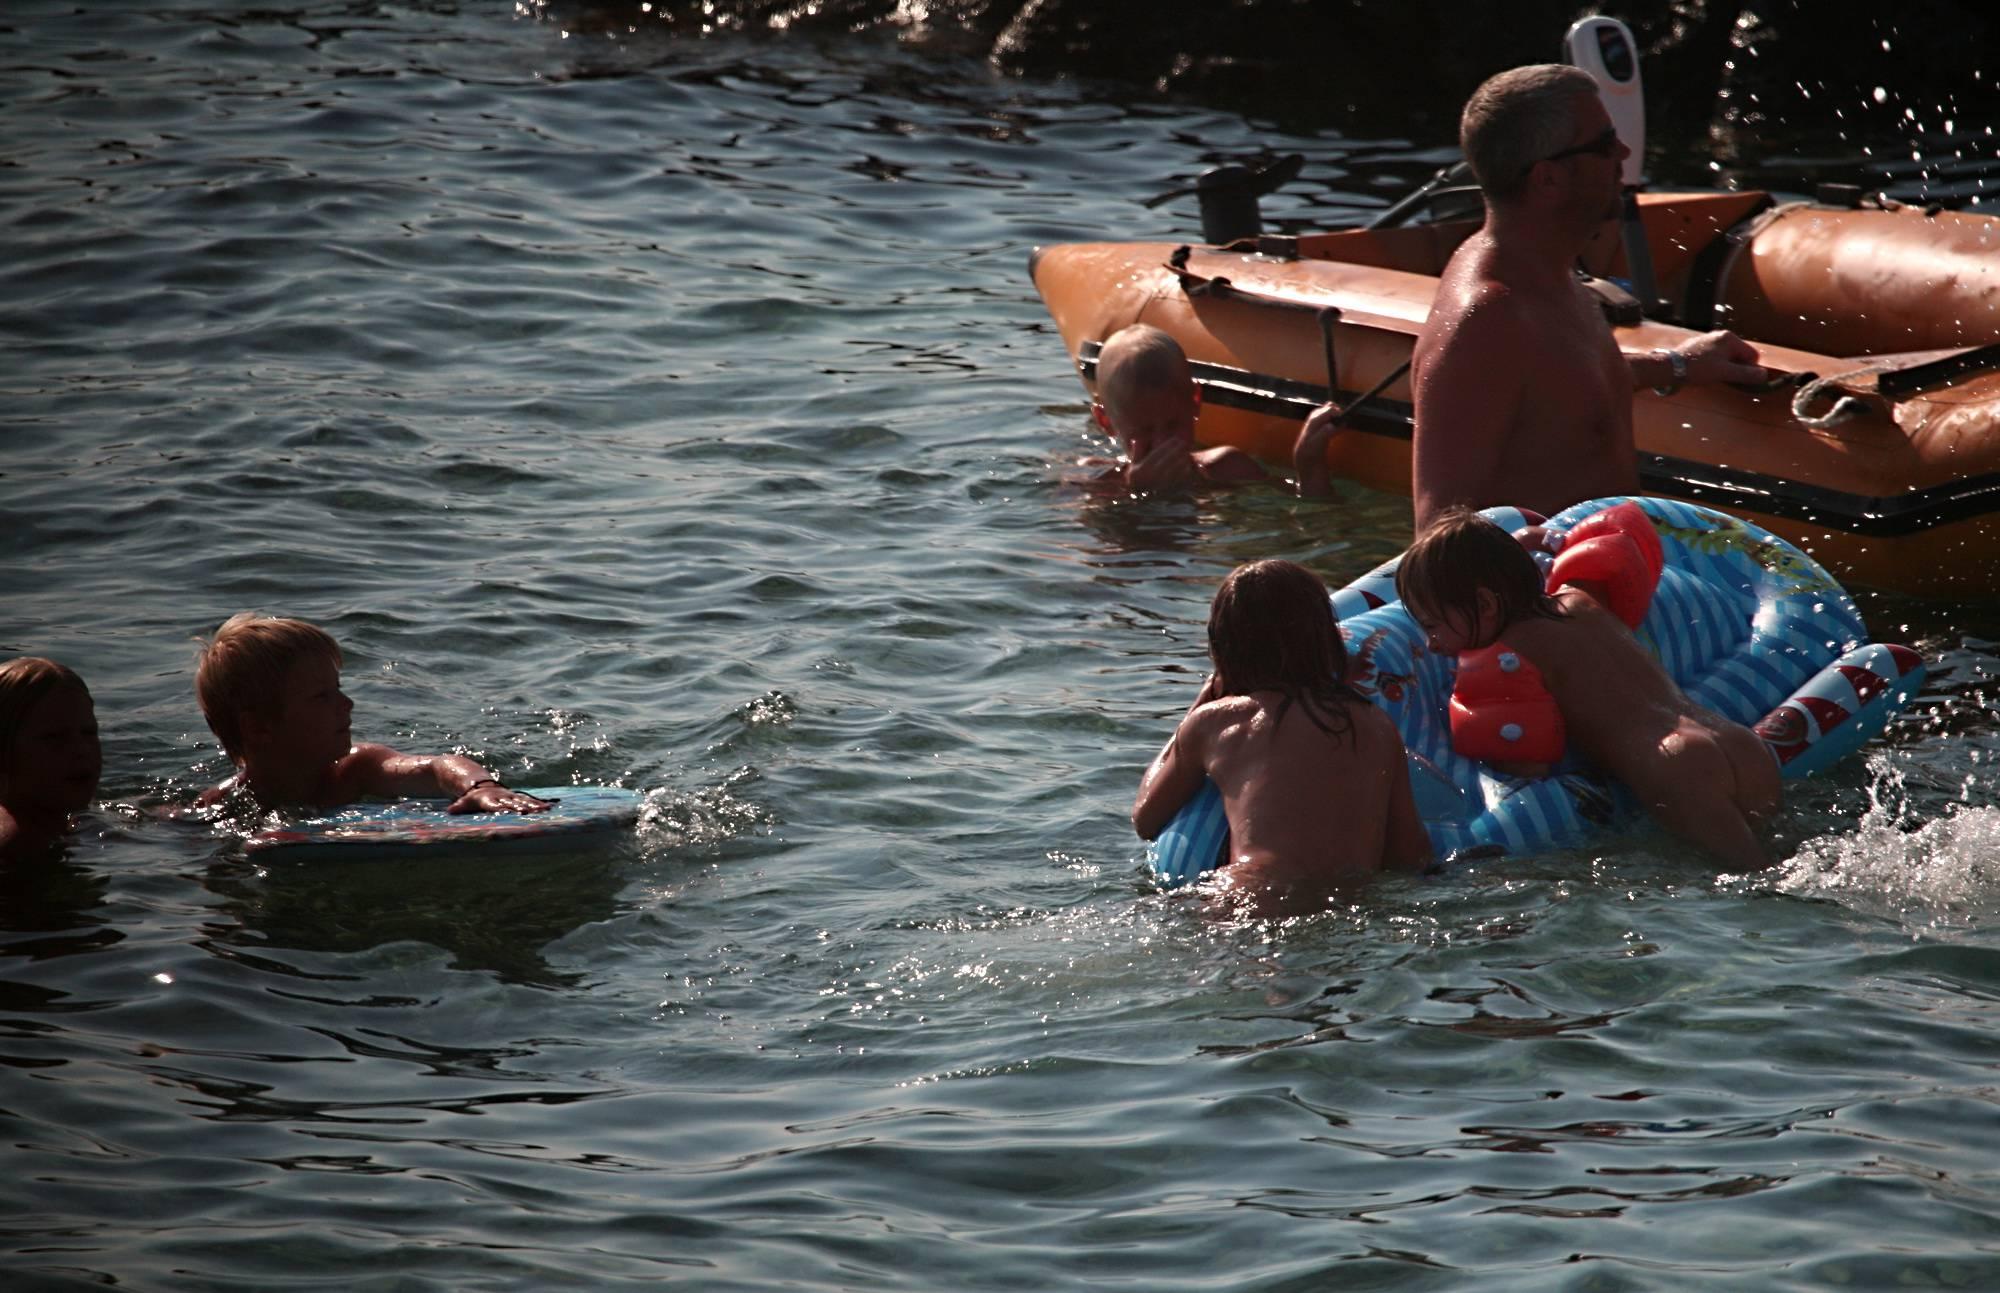 Full Family Nudist Boating - 4